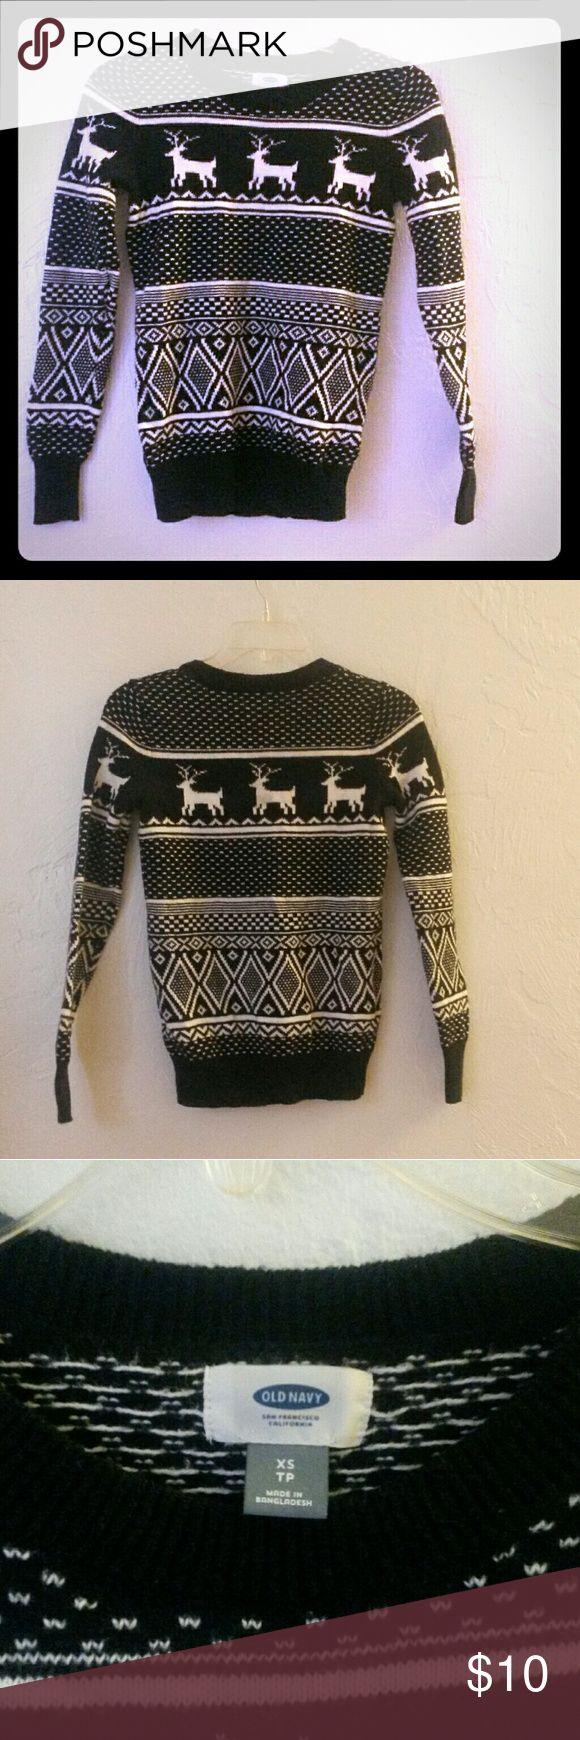 Old Navy San Francisco California Sweater Reindeer/Christmas Sweater Old Navy Sweaters